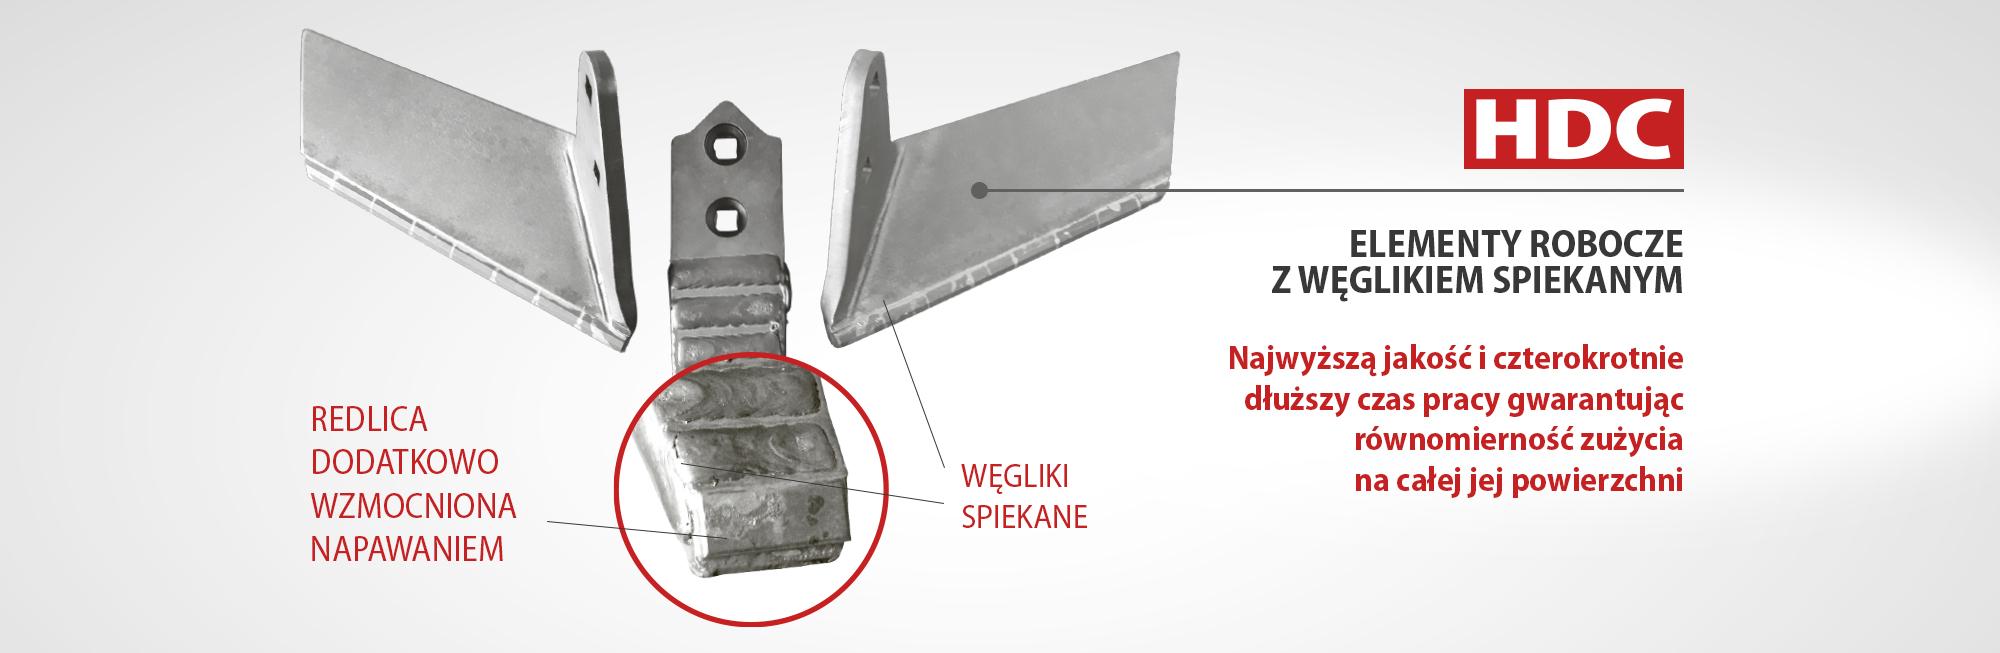 UNIA_rotator_weglik-spiekany_pl